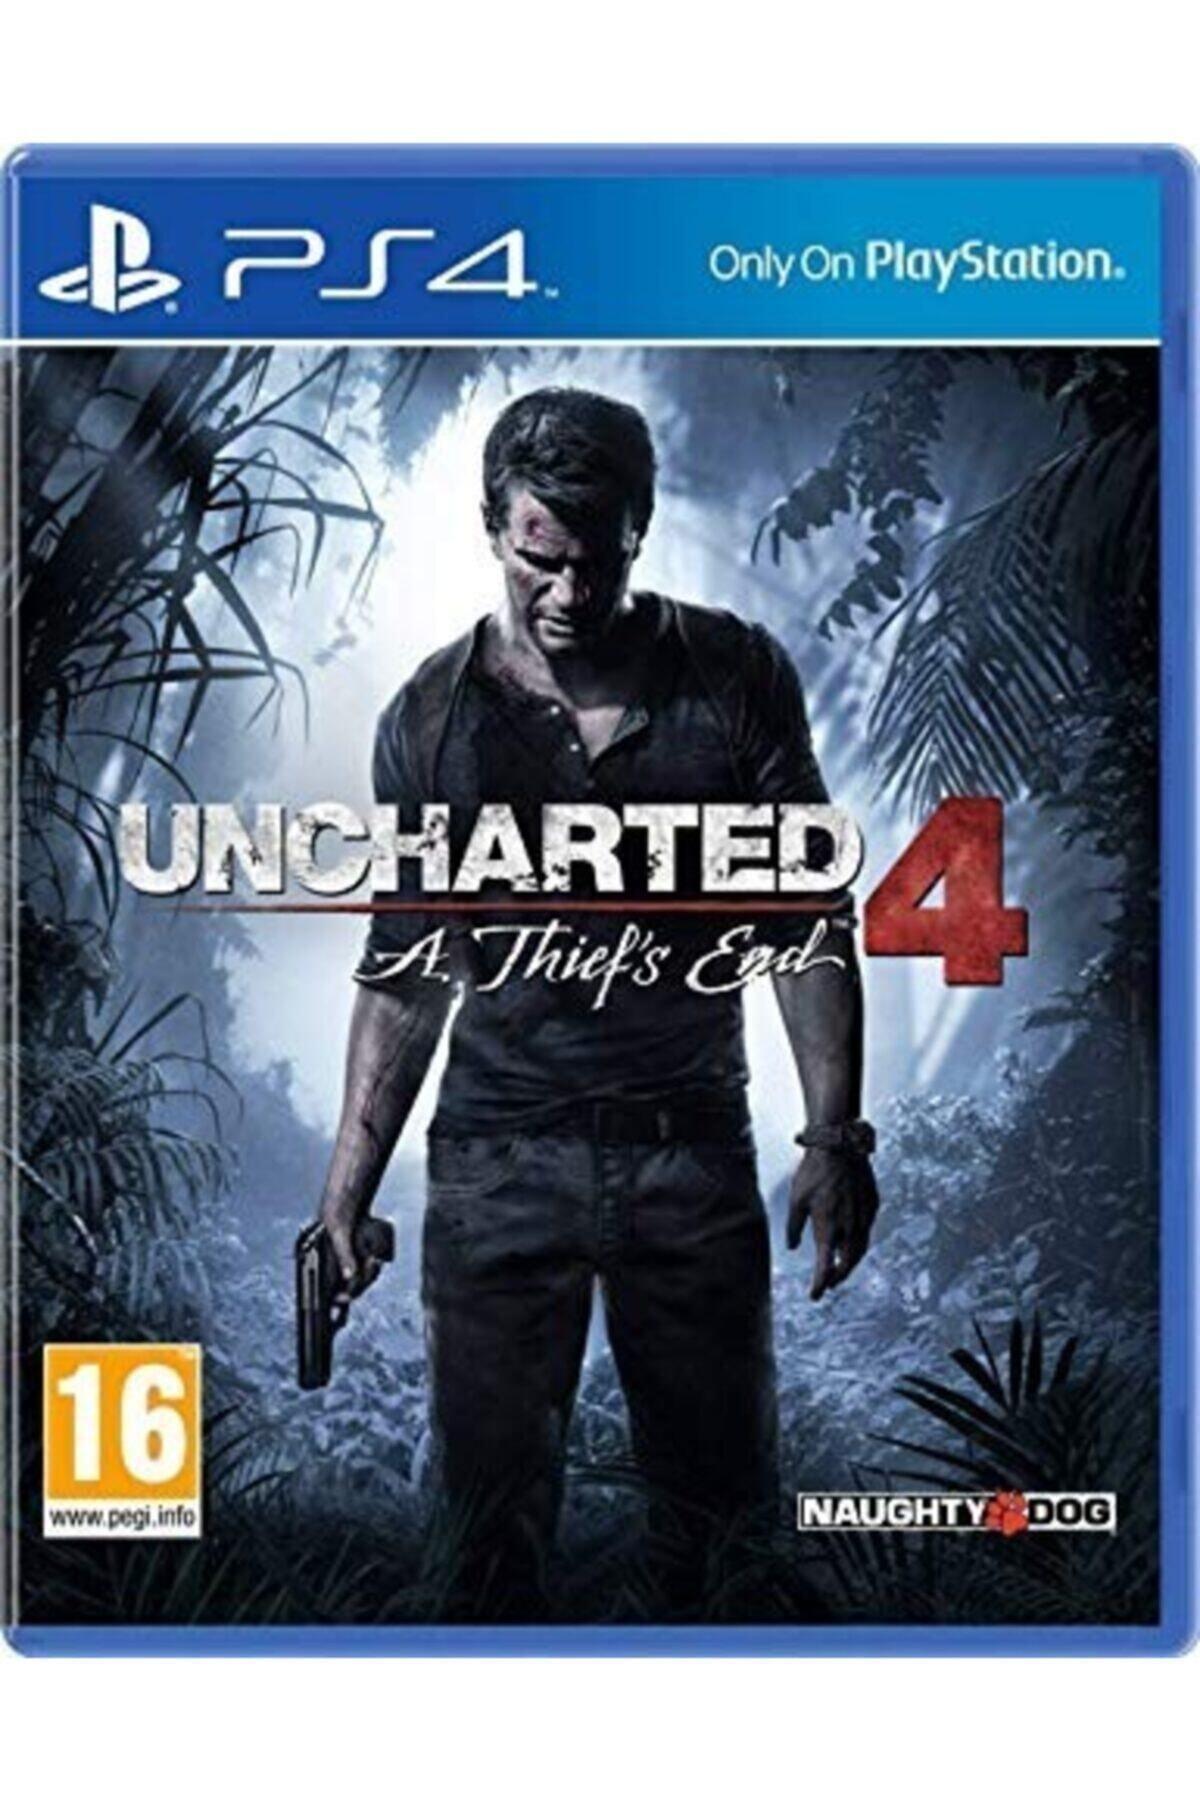 Naughty Dog Ps4 Uncharted 4- Orjinal Oyun - Sıfır Jelatin 1